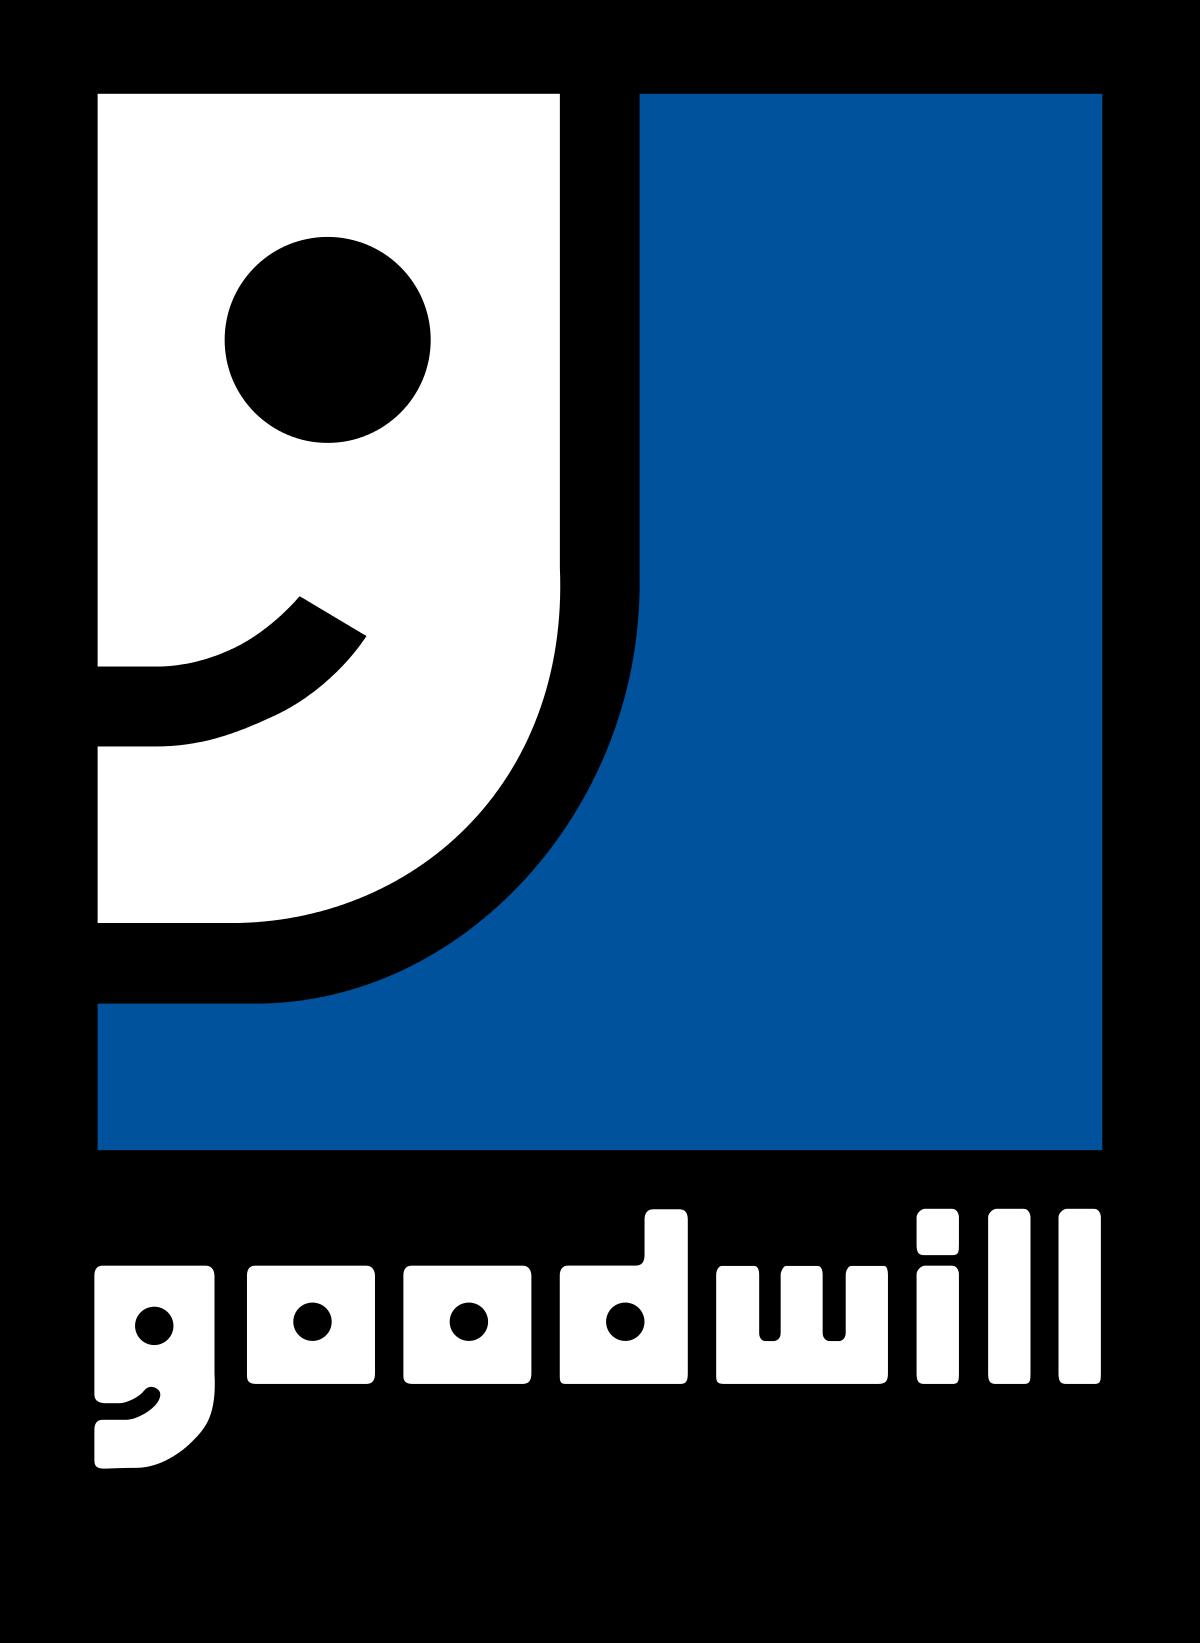 Goodwill/Goodwill Industries